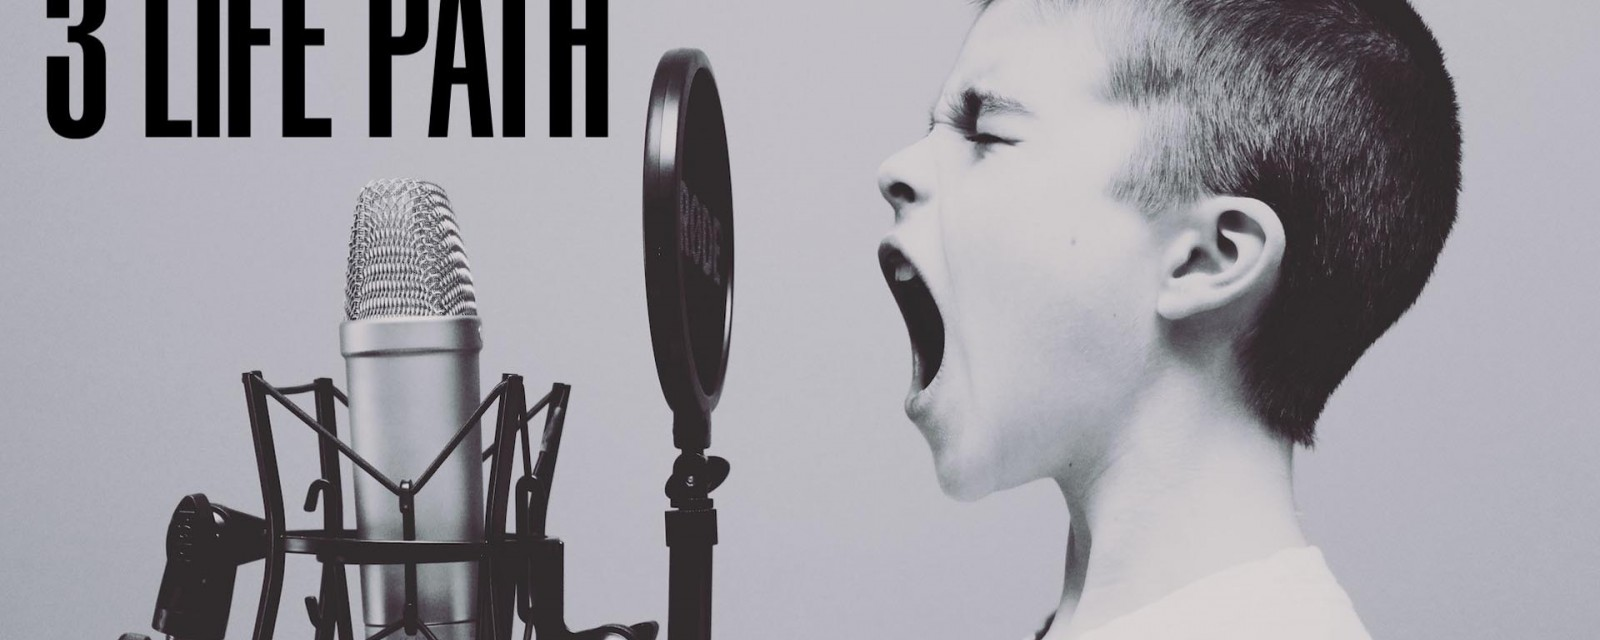 3 Life Path: The Communicator | Felicia Bender